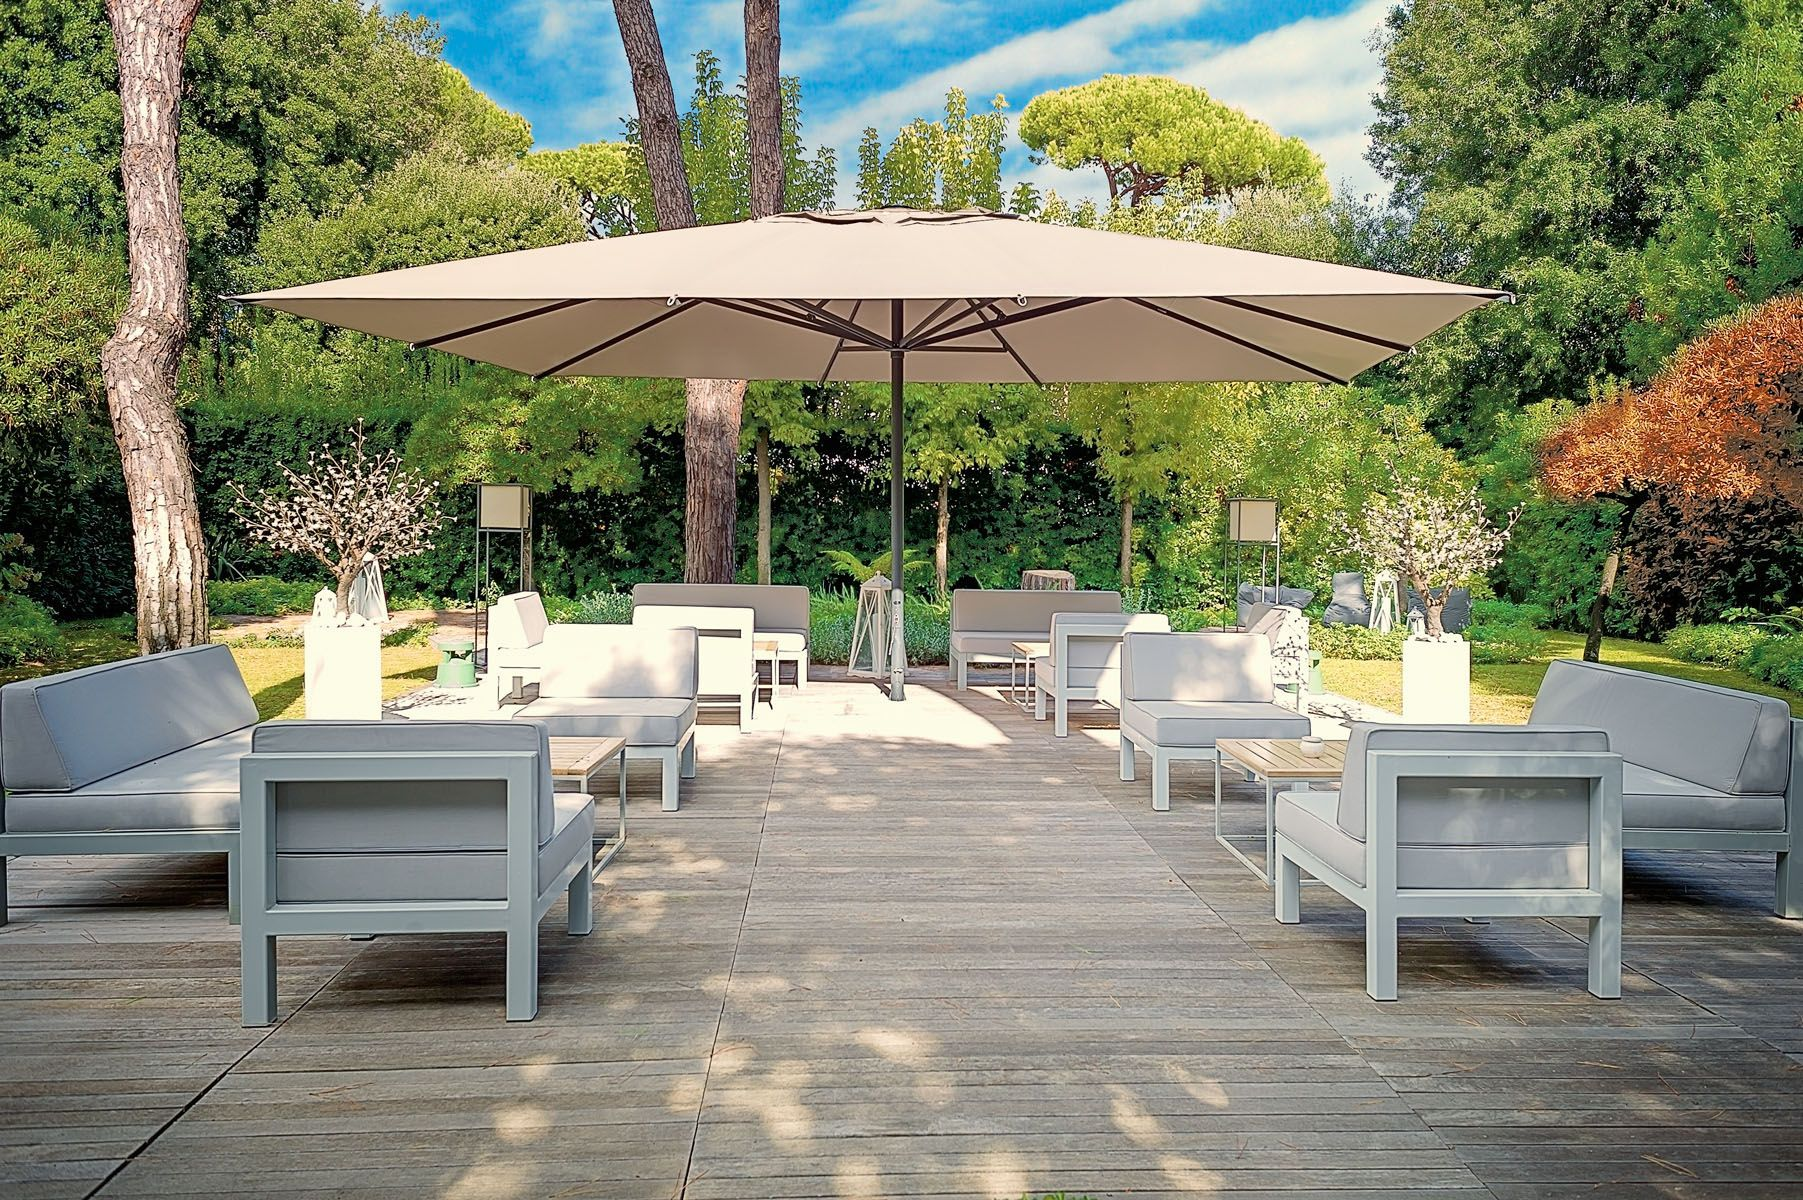 Poggesi Usa Creates Durable Luxury Large Commercial Residential Umbrellas Customize Your Own View Outdoor Umbrella Pool Umbrellas Large Patio Umbrellas